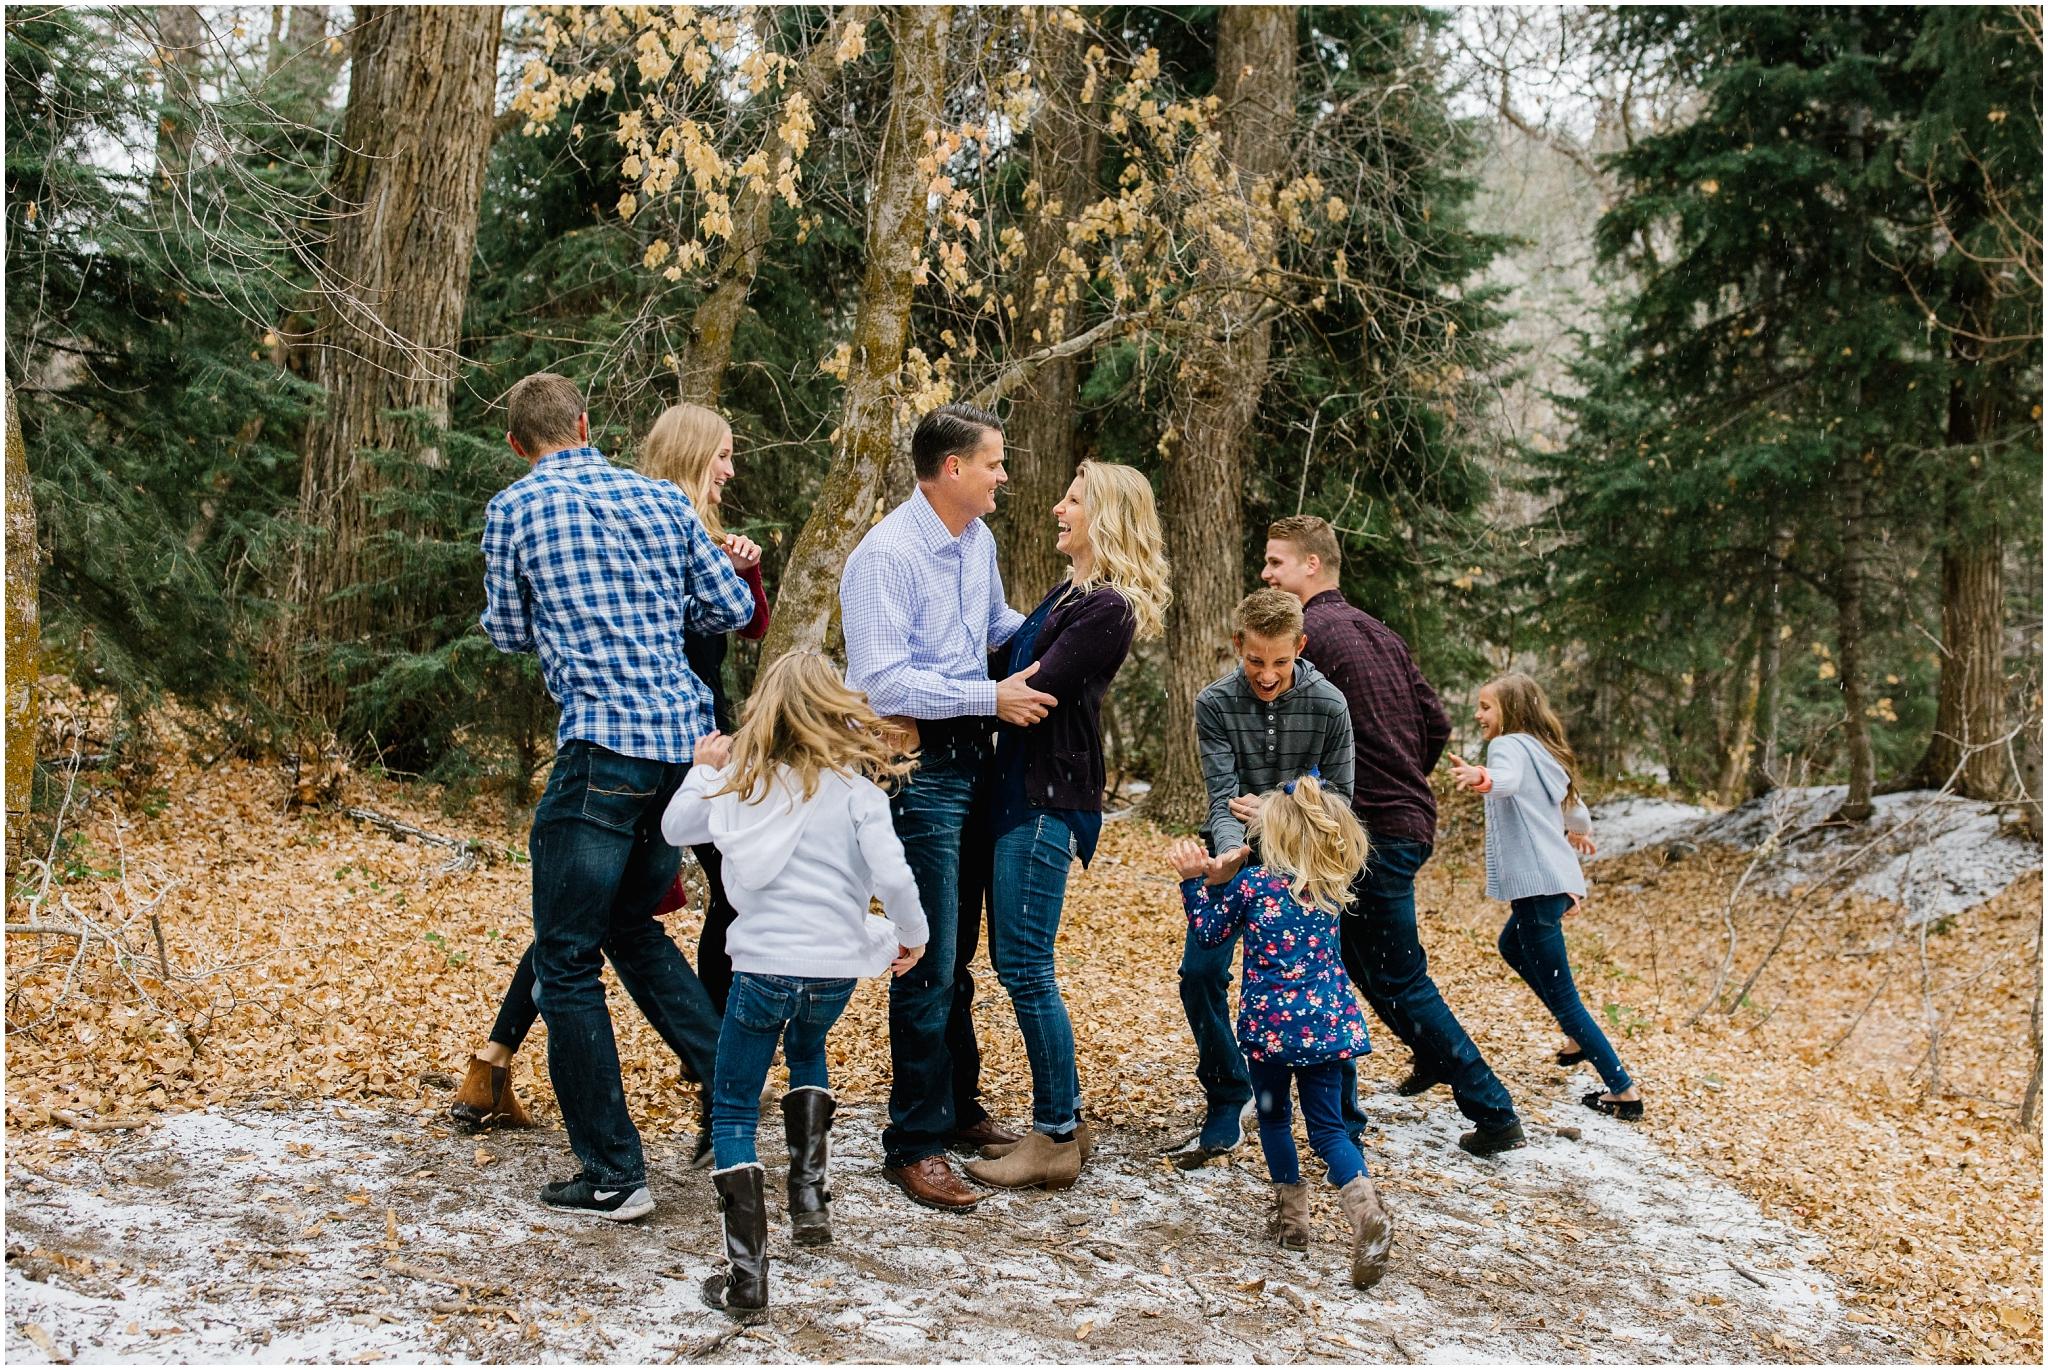 Vance-15_Lizzie-B-Imagery-Utah-Family-Photographer-Salt-Lake-City-Park-City-Utah-County-Payson-Canyon.jpg